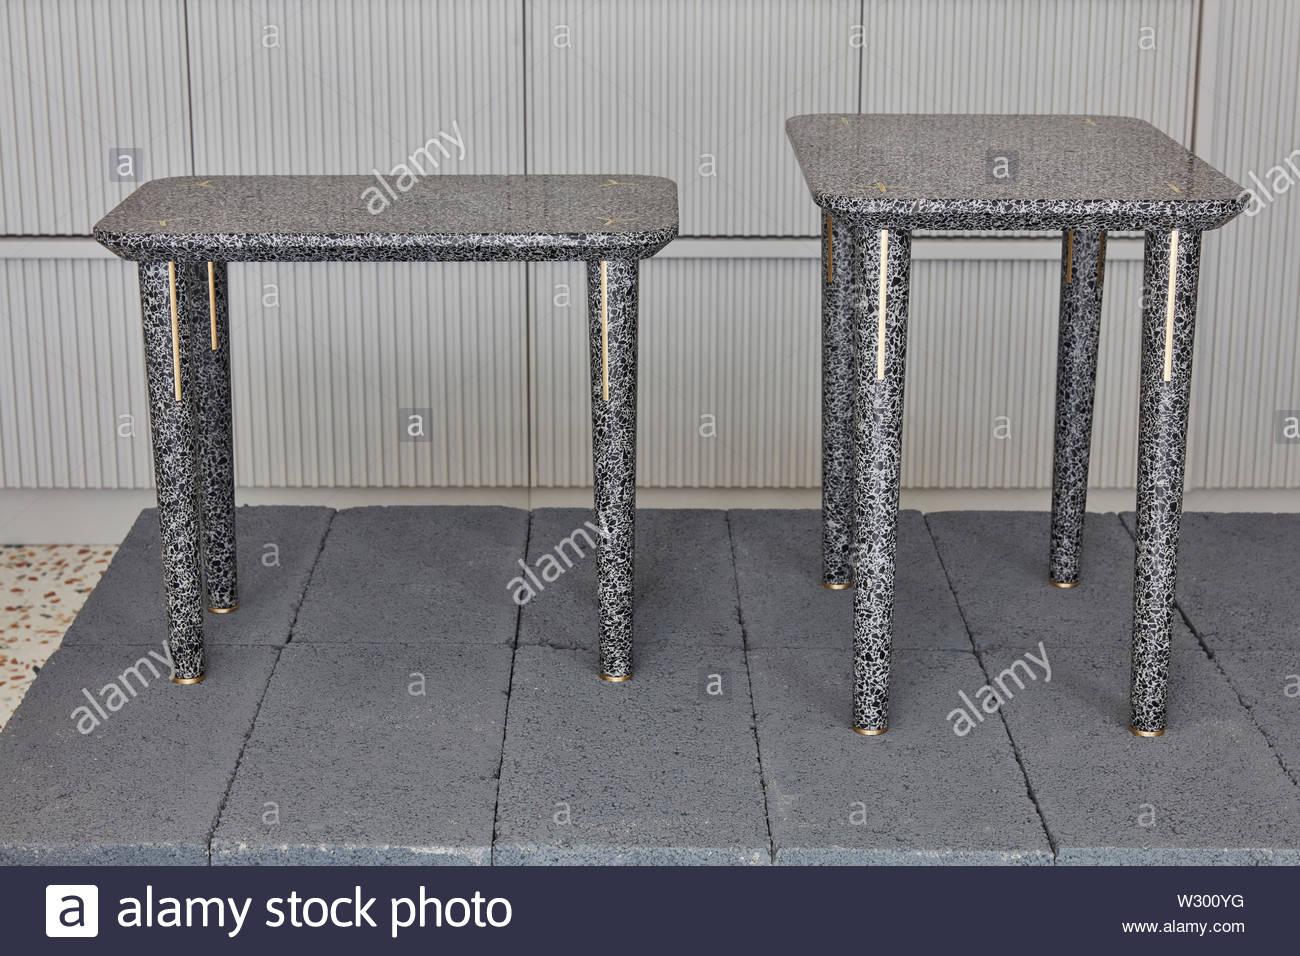 Nesting tables. Joyce Wang Showroom, London, United Kingdom. Architect: n/a, 2018. - Stock Image